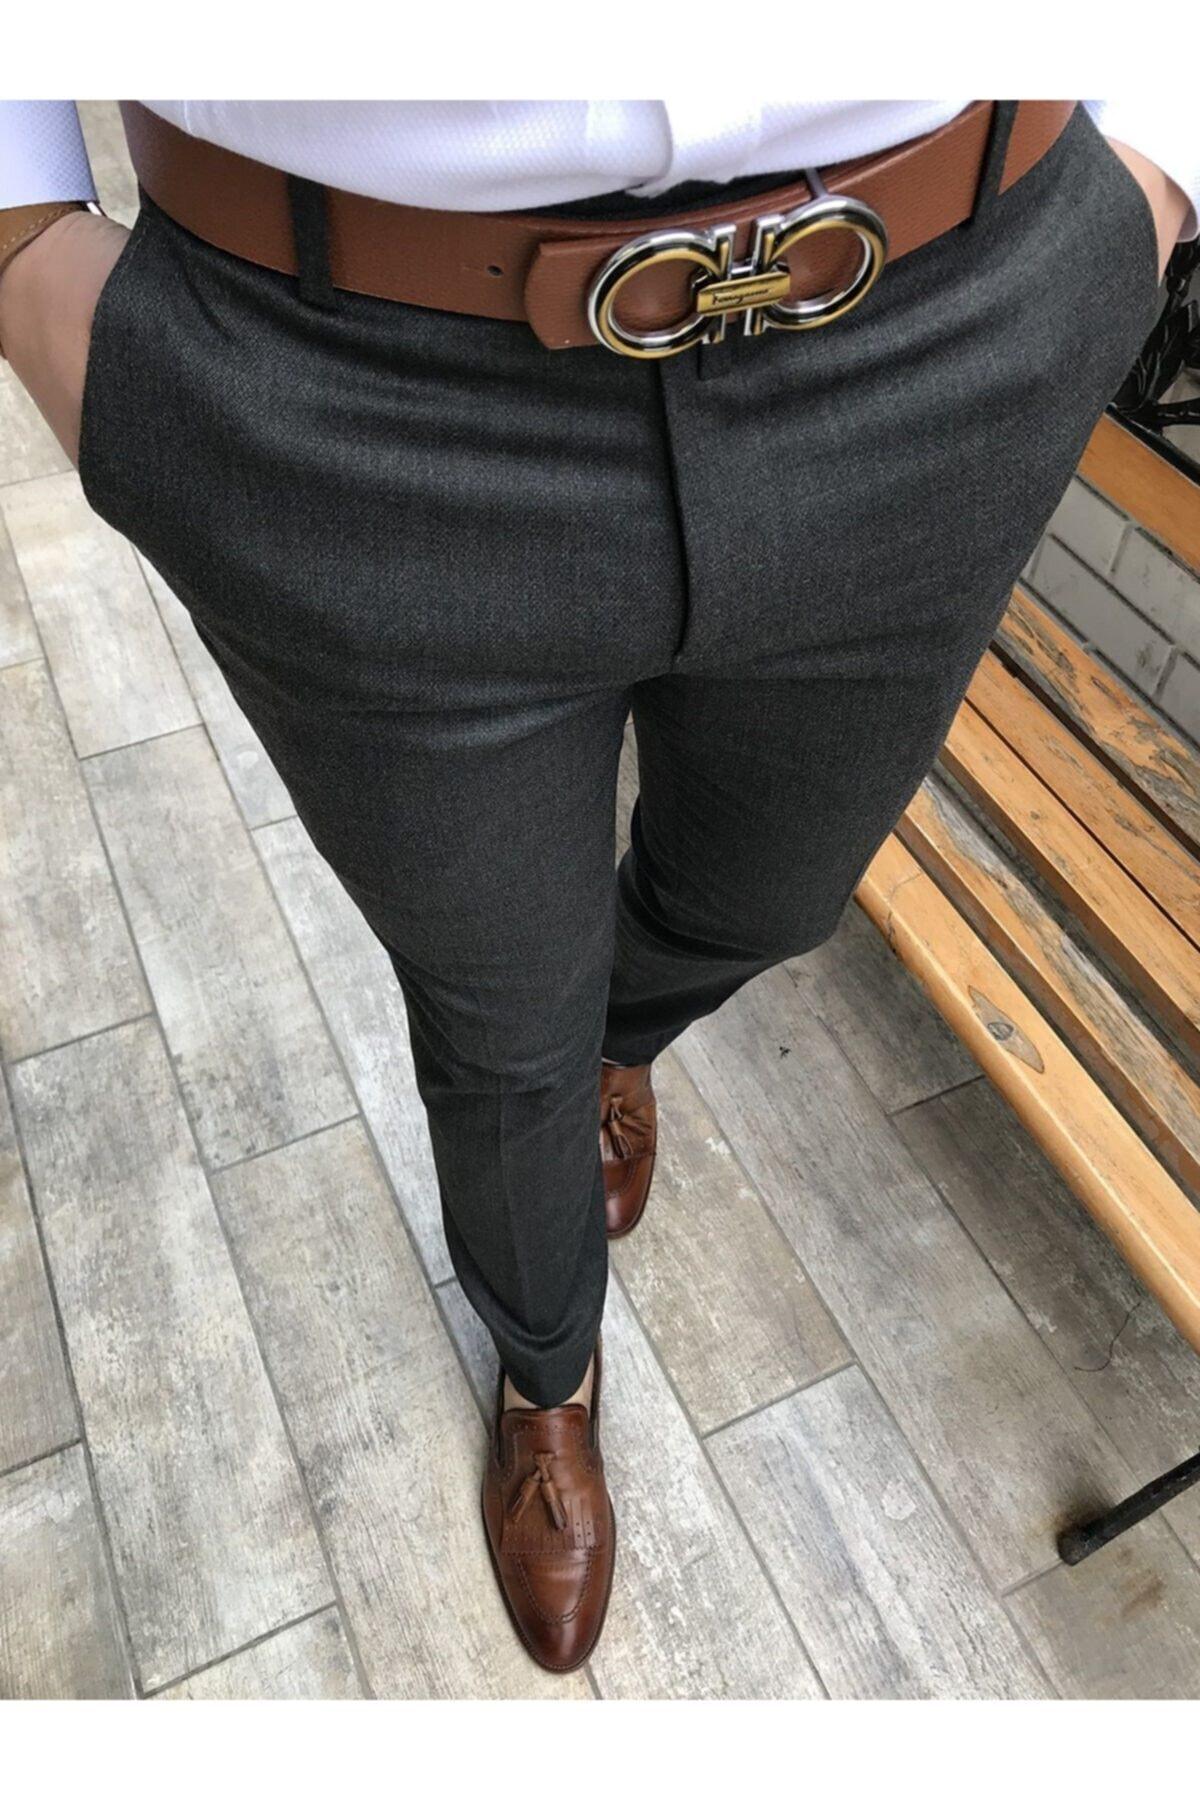 Italyan Kesim Slim Fit Antrasit Kumaş Pantolon T3485